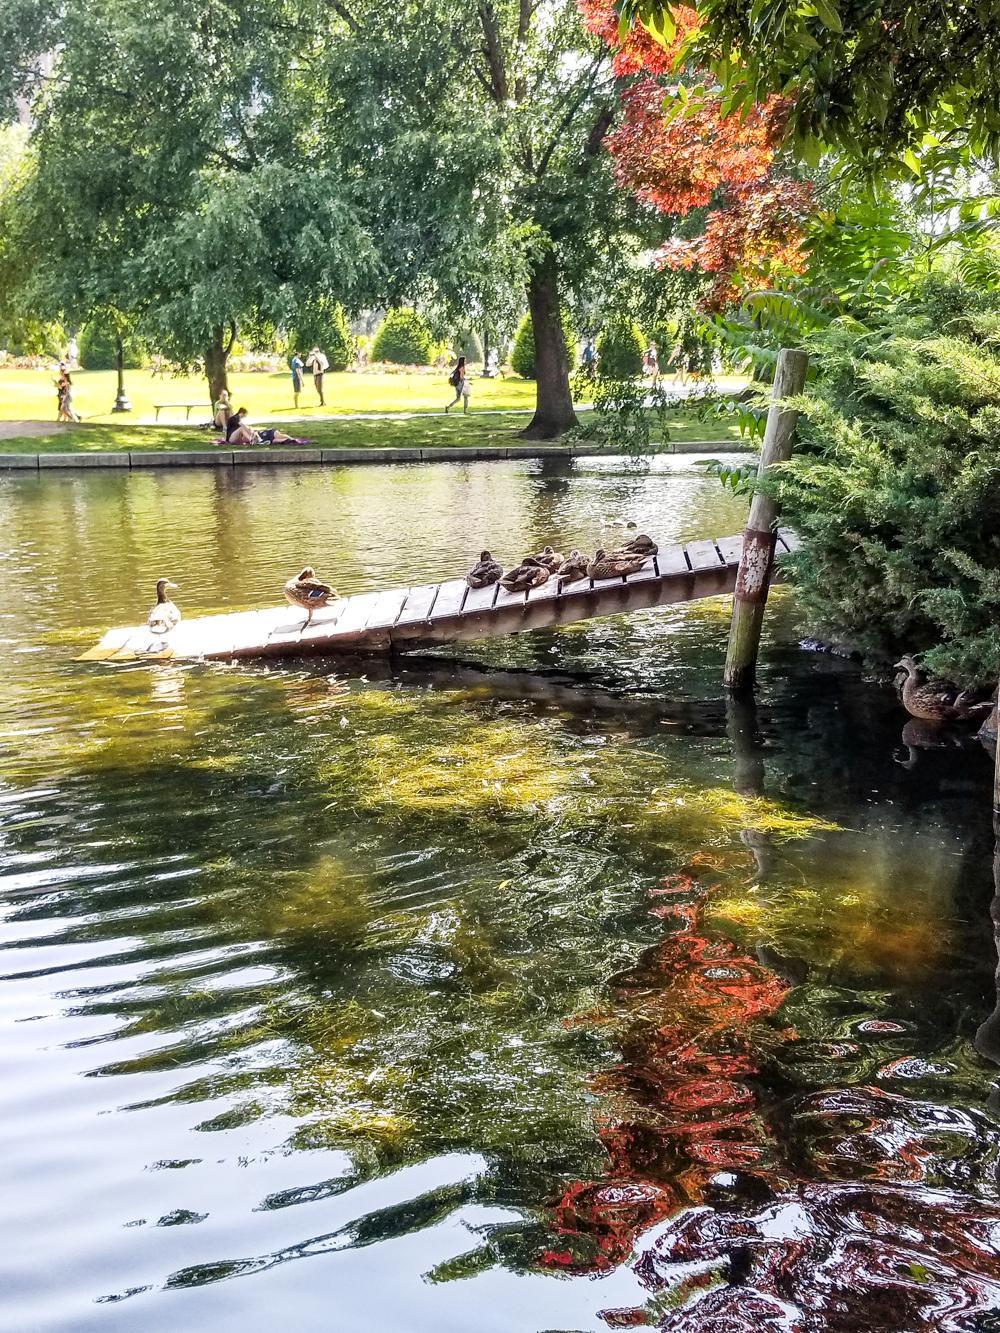 ducks in Boston Public Gardens